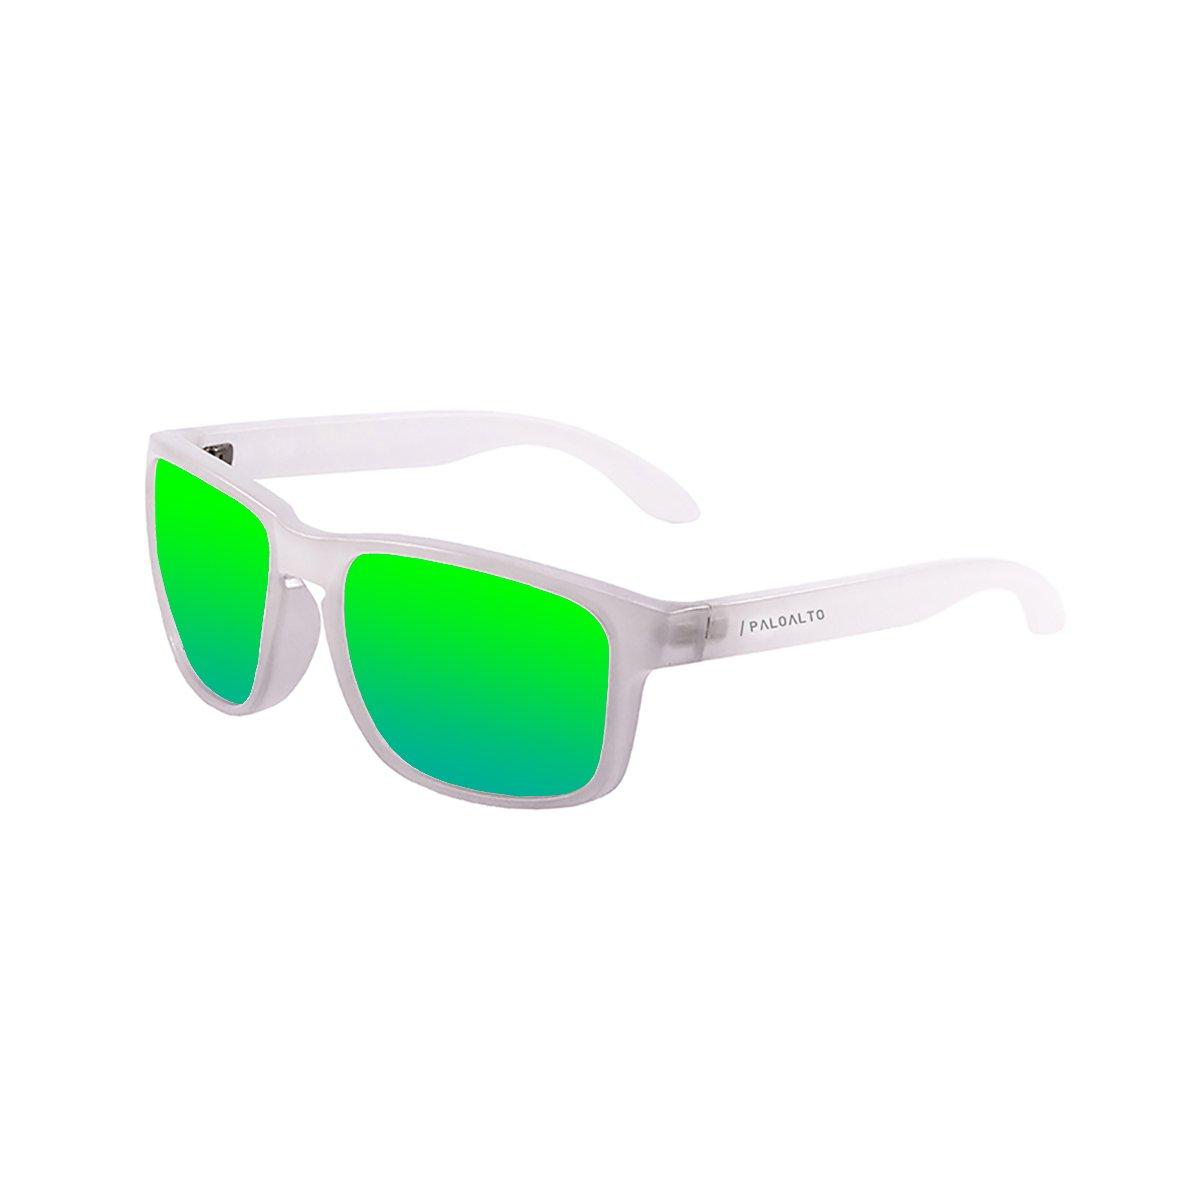 Paloalto Sunglasses p19202.13 Gafas de Sol Unisex, Verde ...